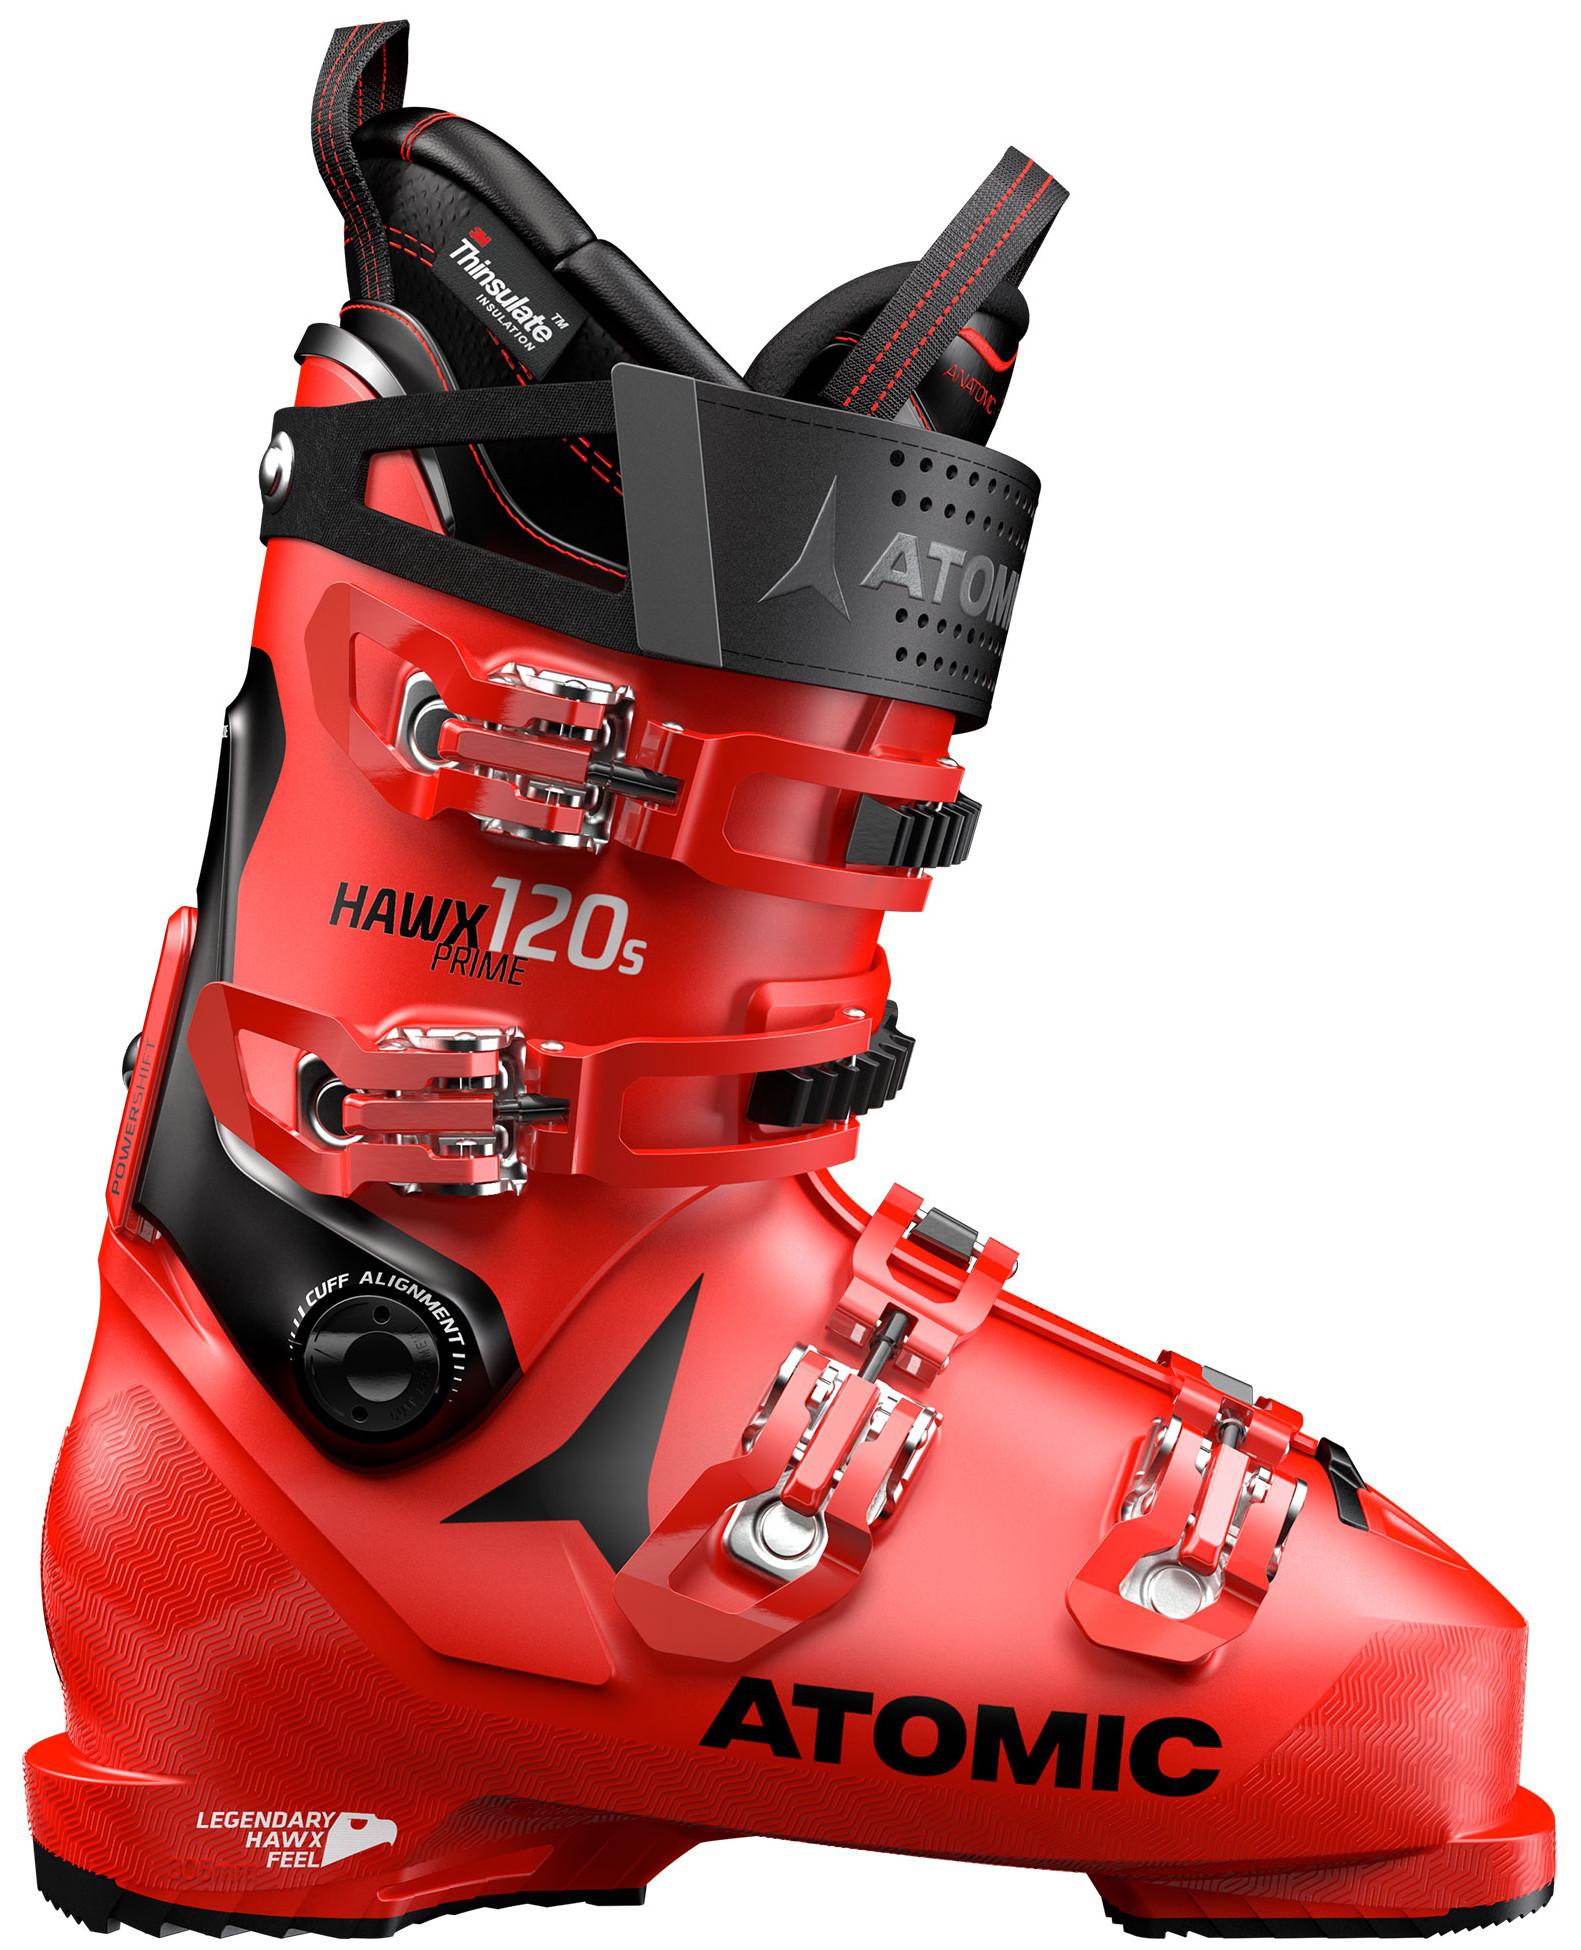 58b0df4771aa Горнолыжные ботинки Atomic Hawx Prime 120 S Red Black - Фото 1 большая